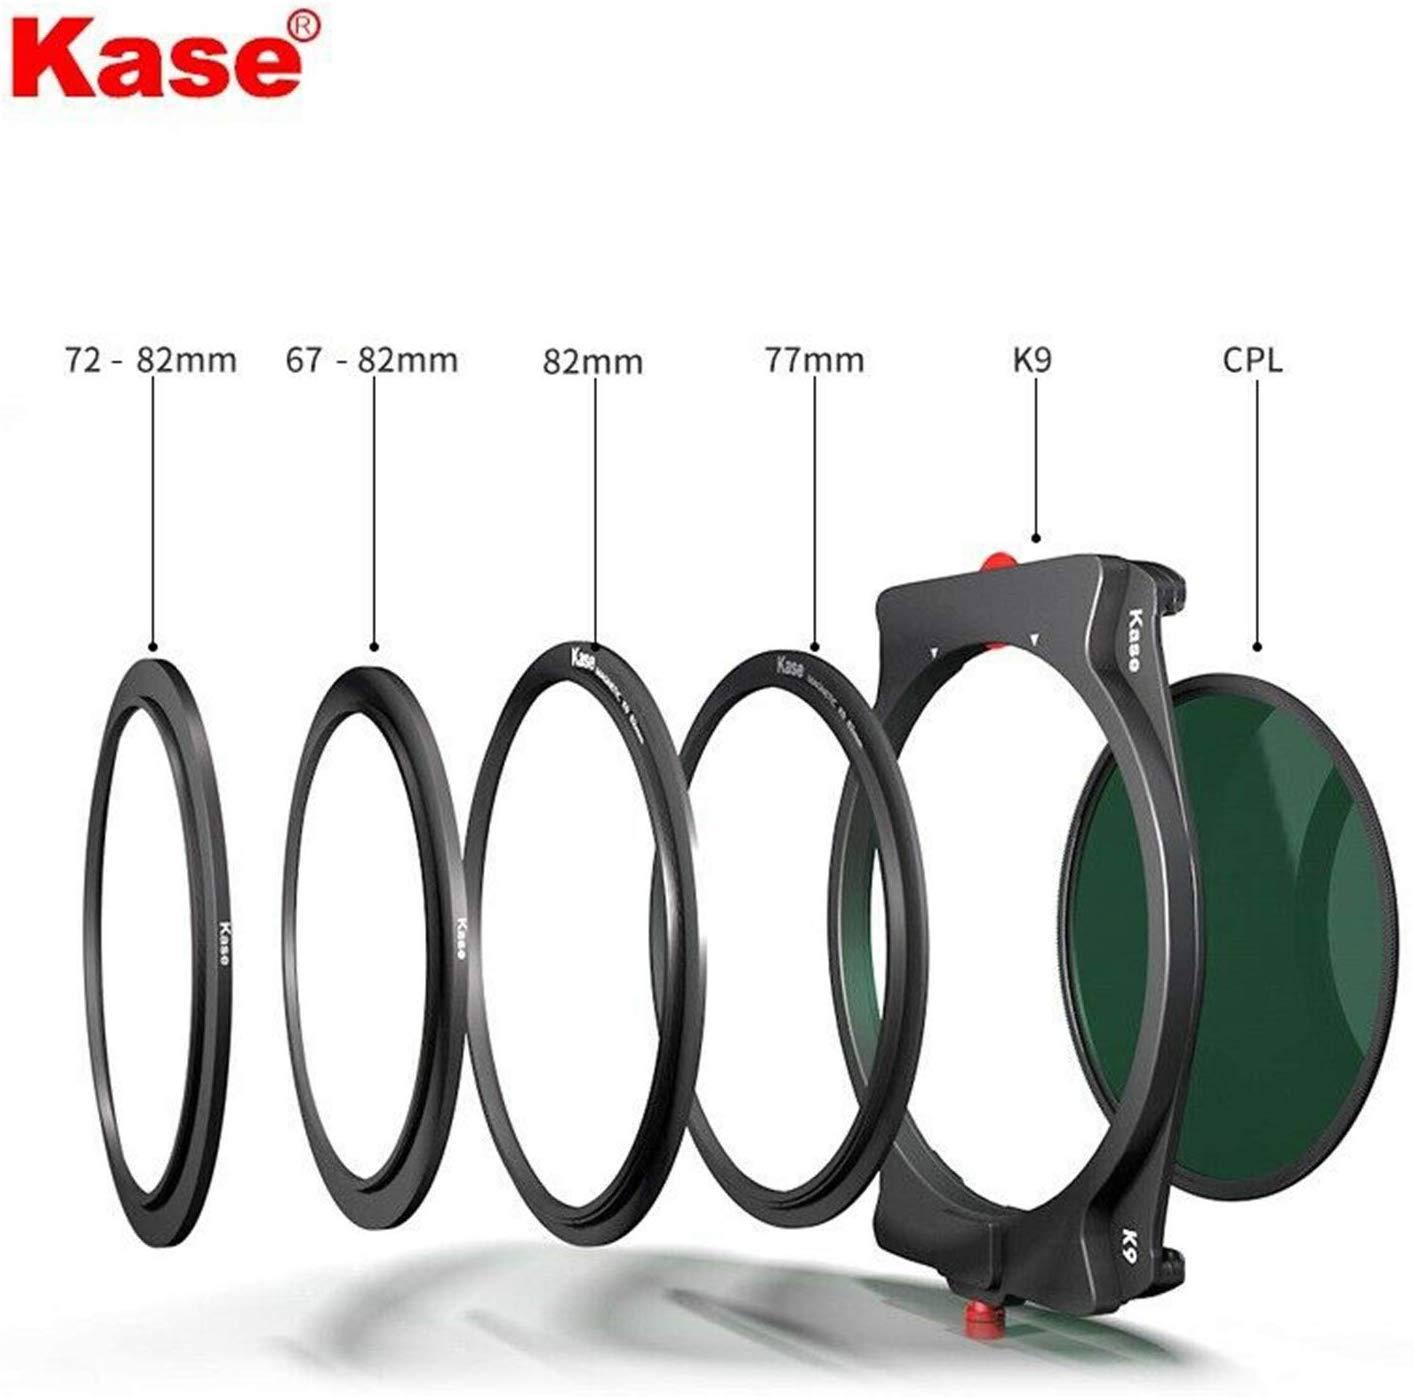 Kit com Suporte + 90 Kase Fino Filtro Titular mm Cpl Magnético 67mm 72mm 77mm 82mm Adaptadores k9 100mm